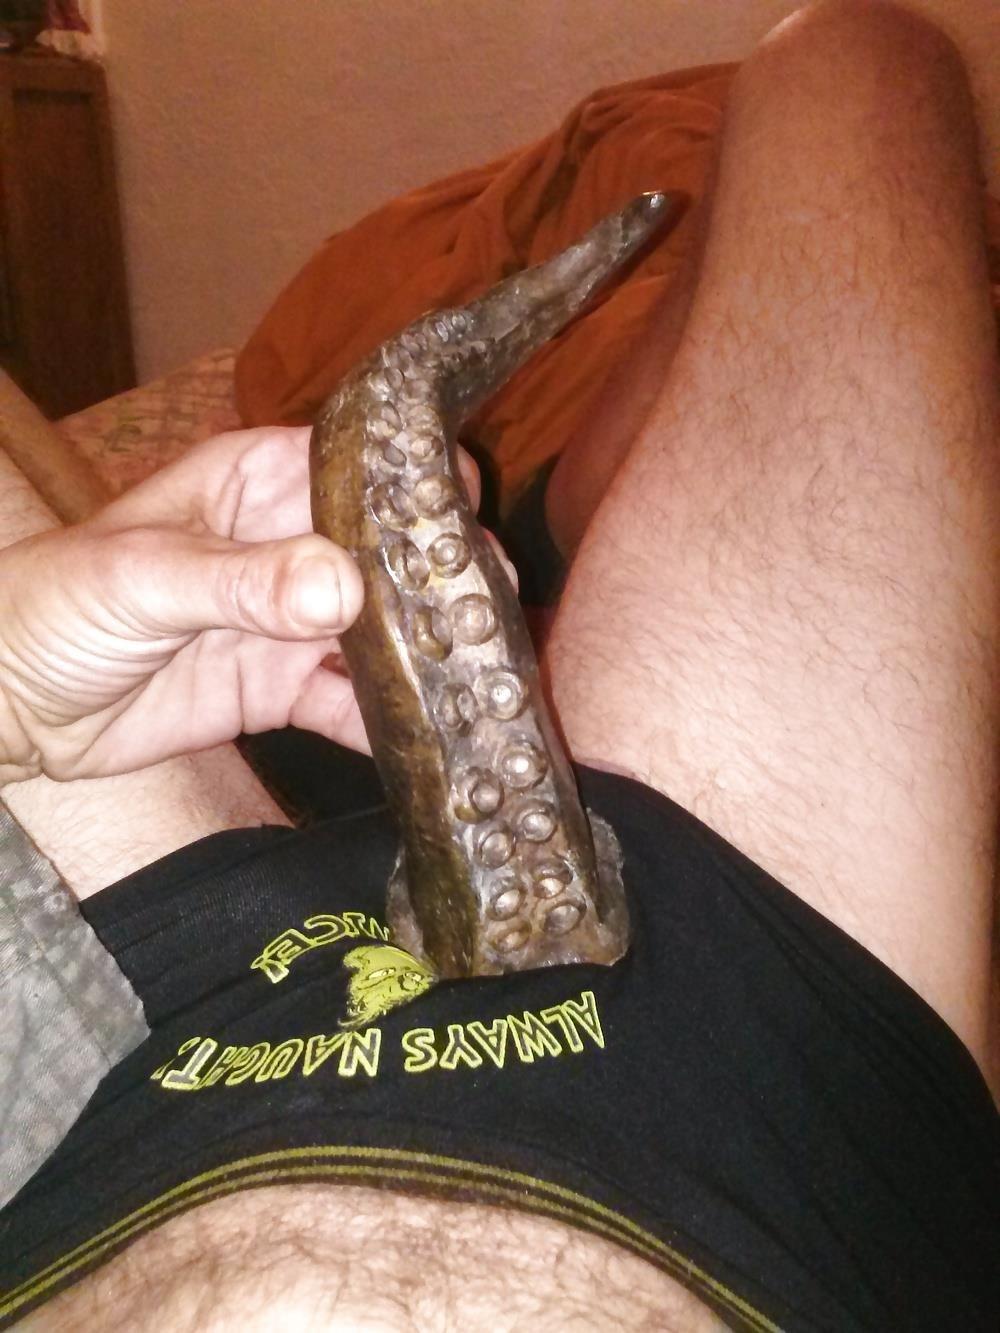 Hd porn free online watch-1405